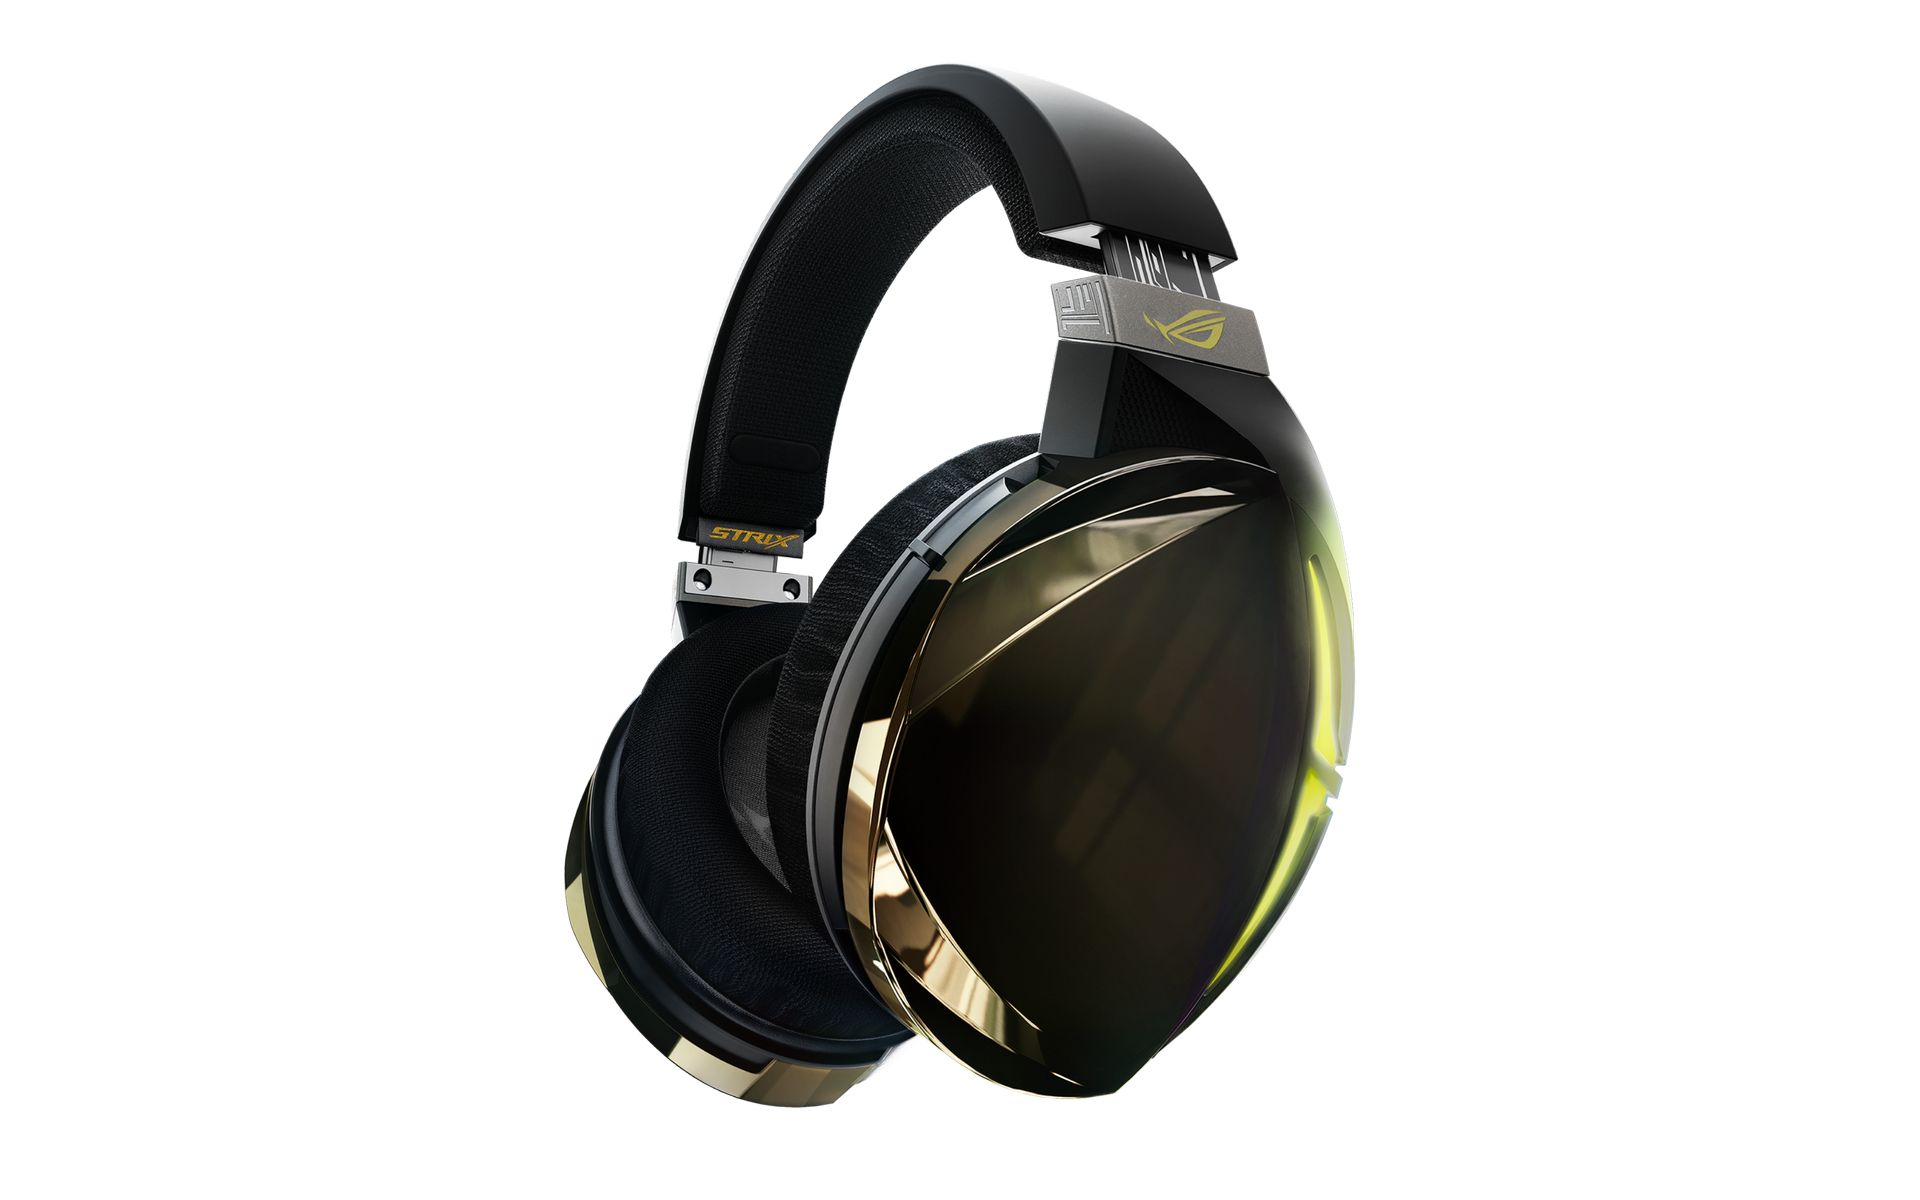 ROG Strix Fusion 700